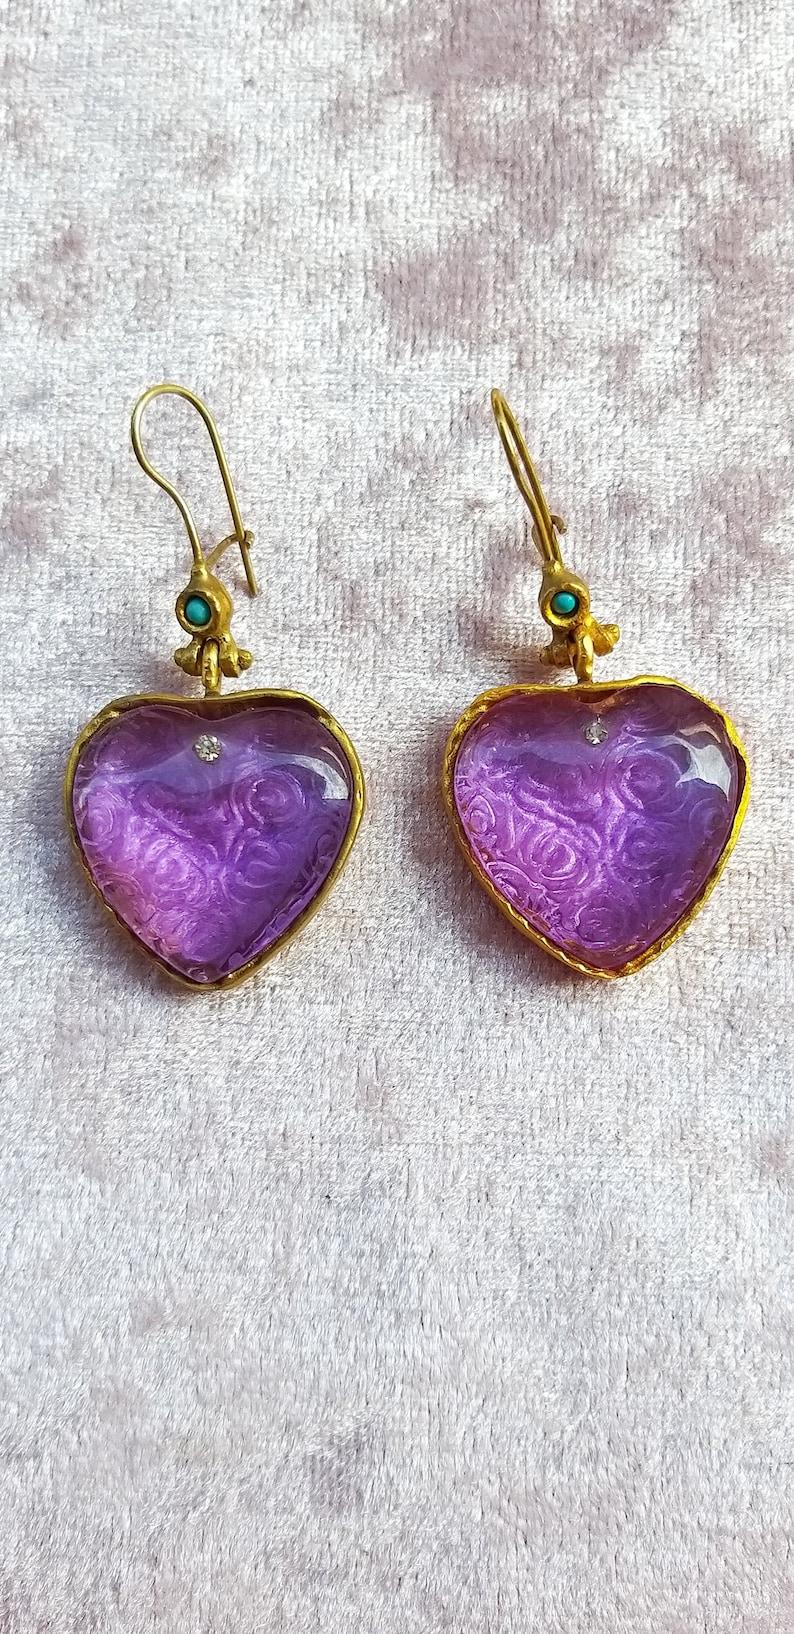 Amethyst hand engraved golden earrings ottoman design